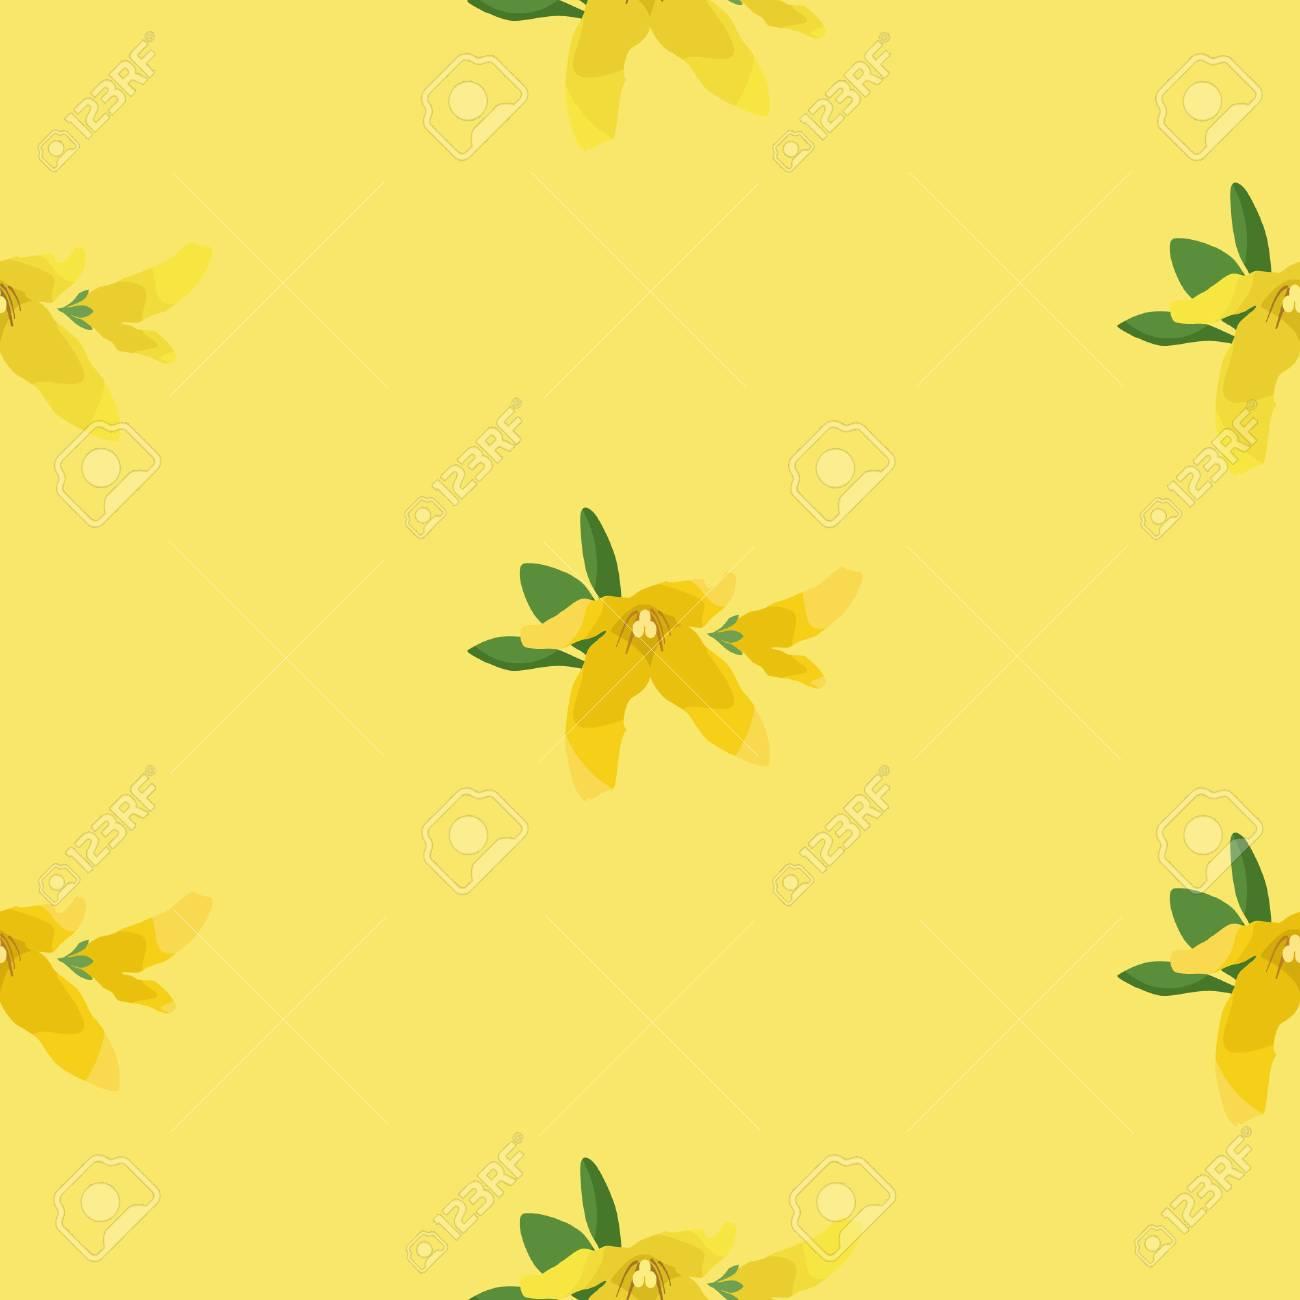 Forsythia blossom seamless pattern vector background. - 96520424